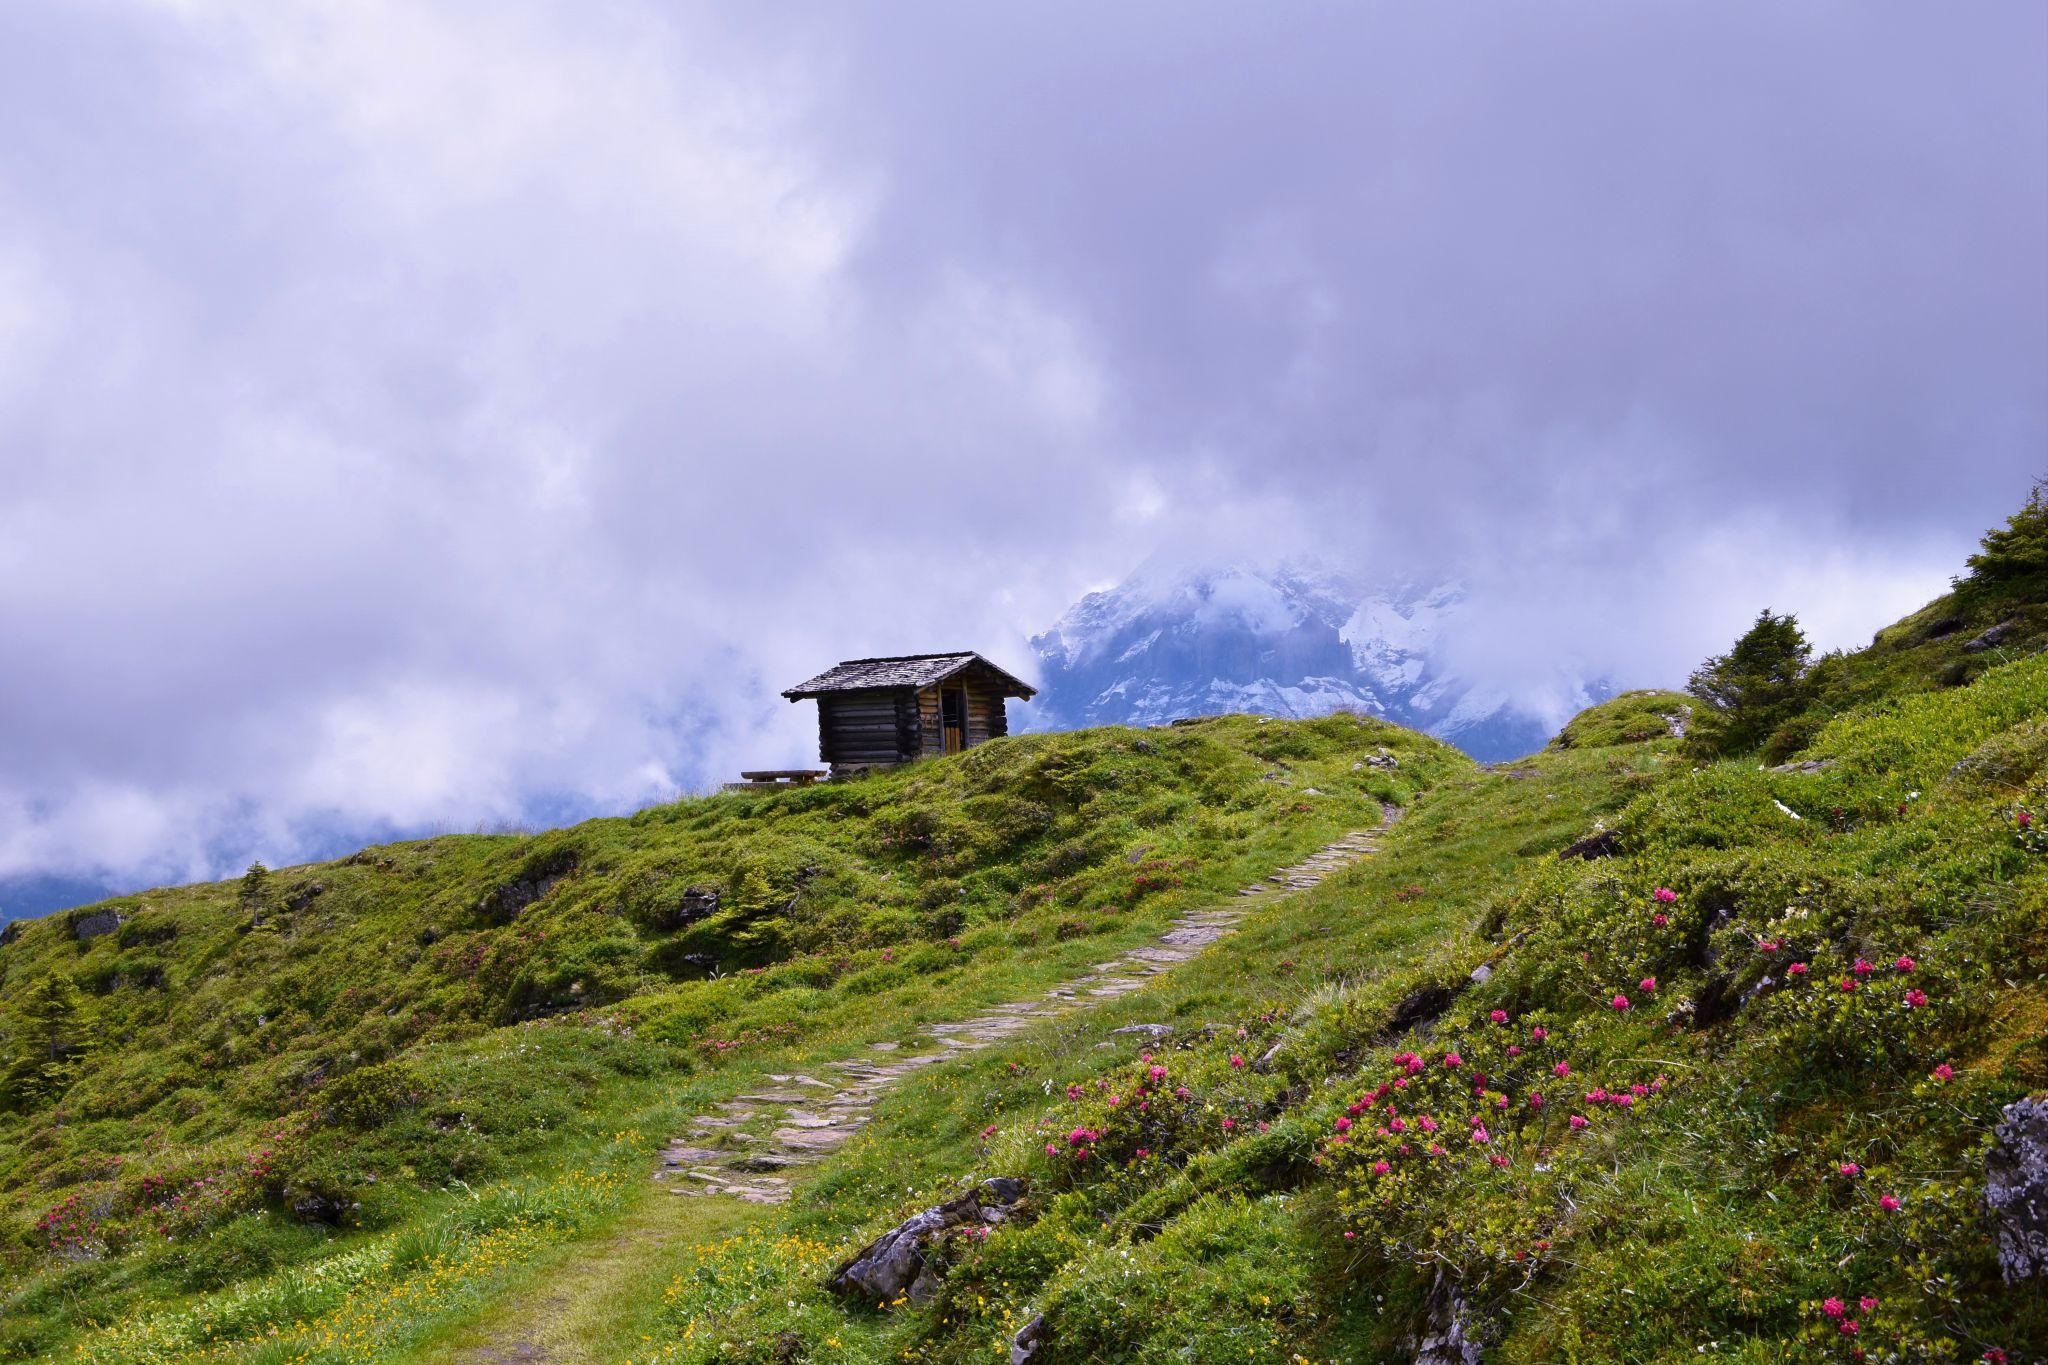 The Swiss Alps, Switzerland